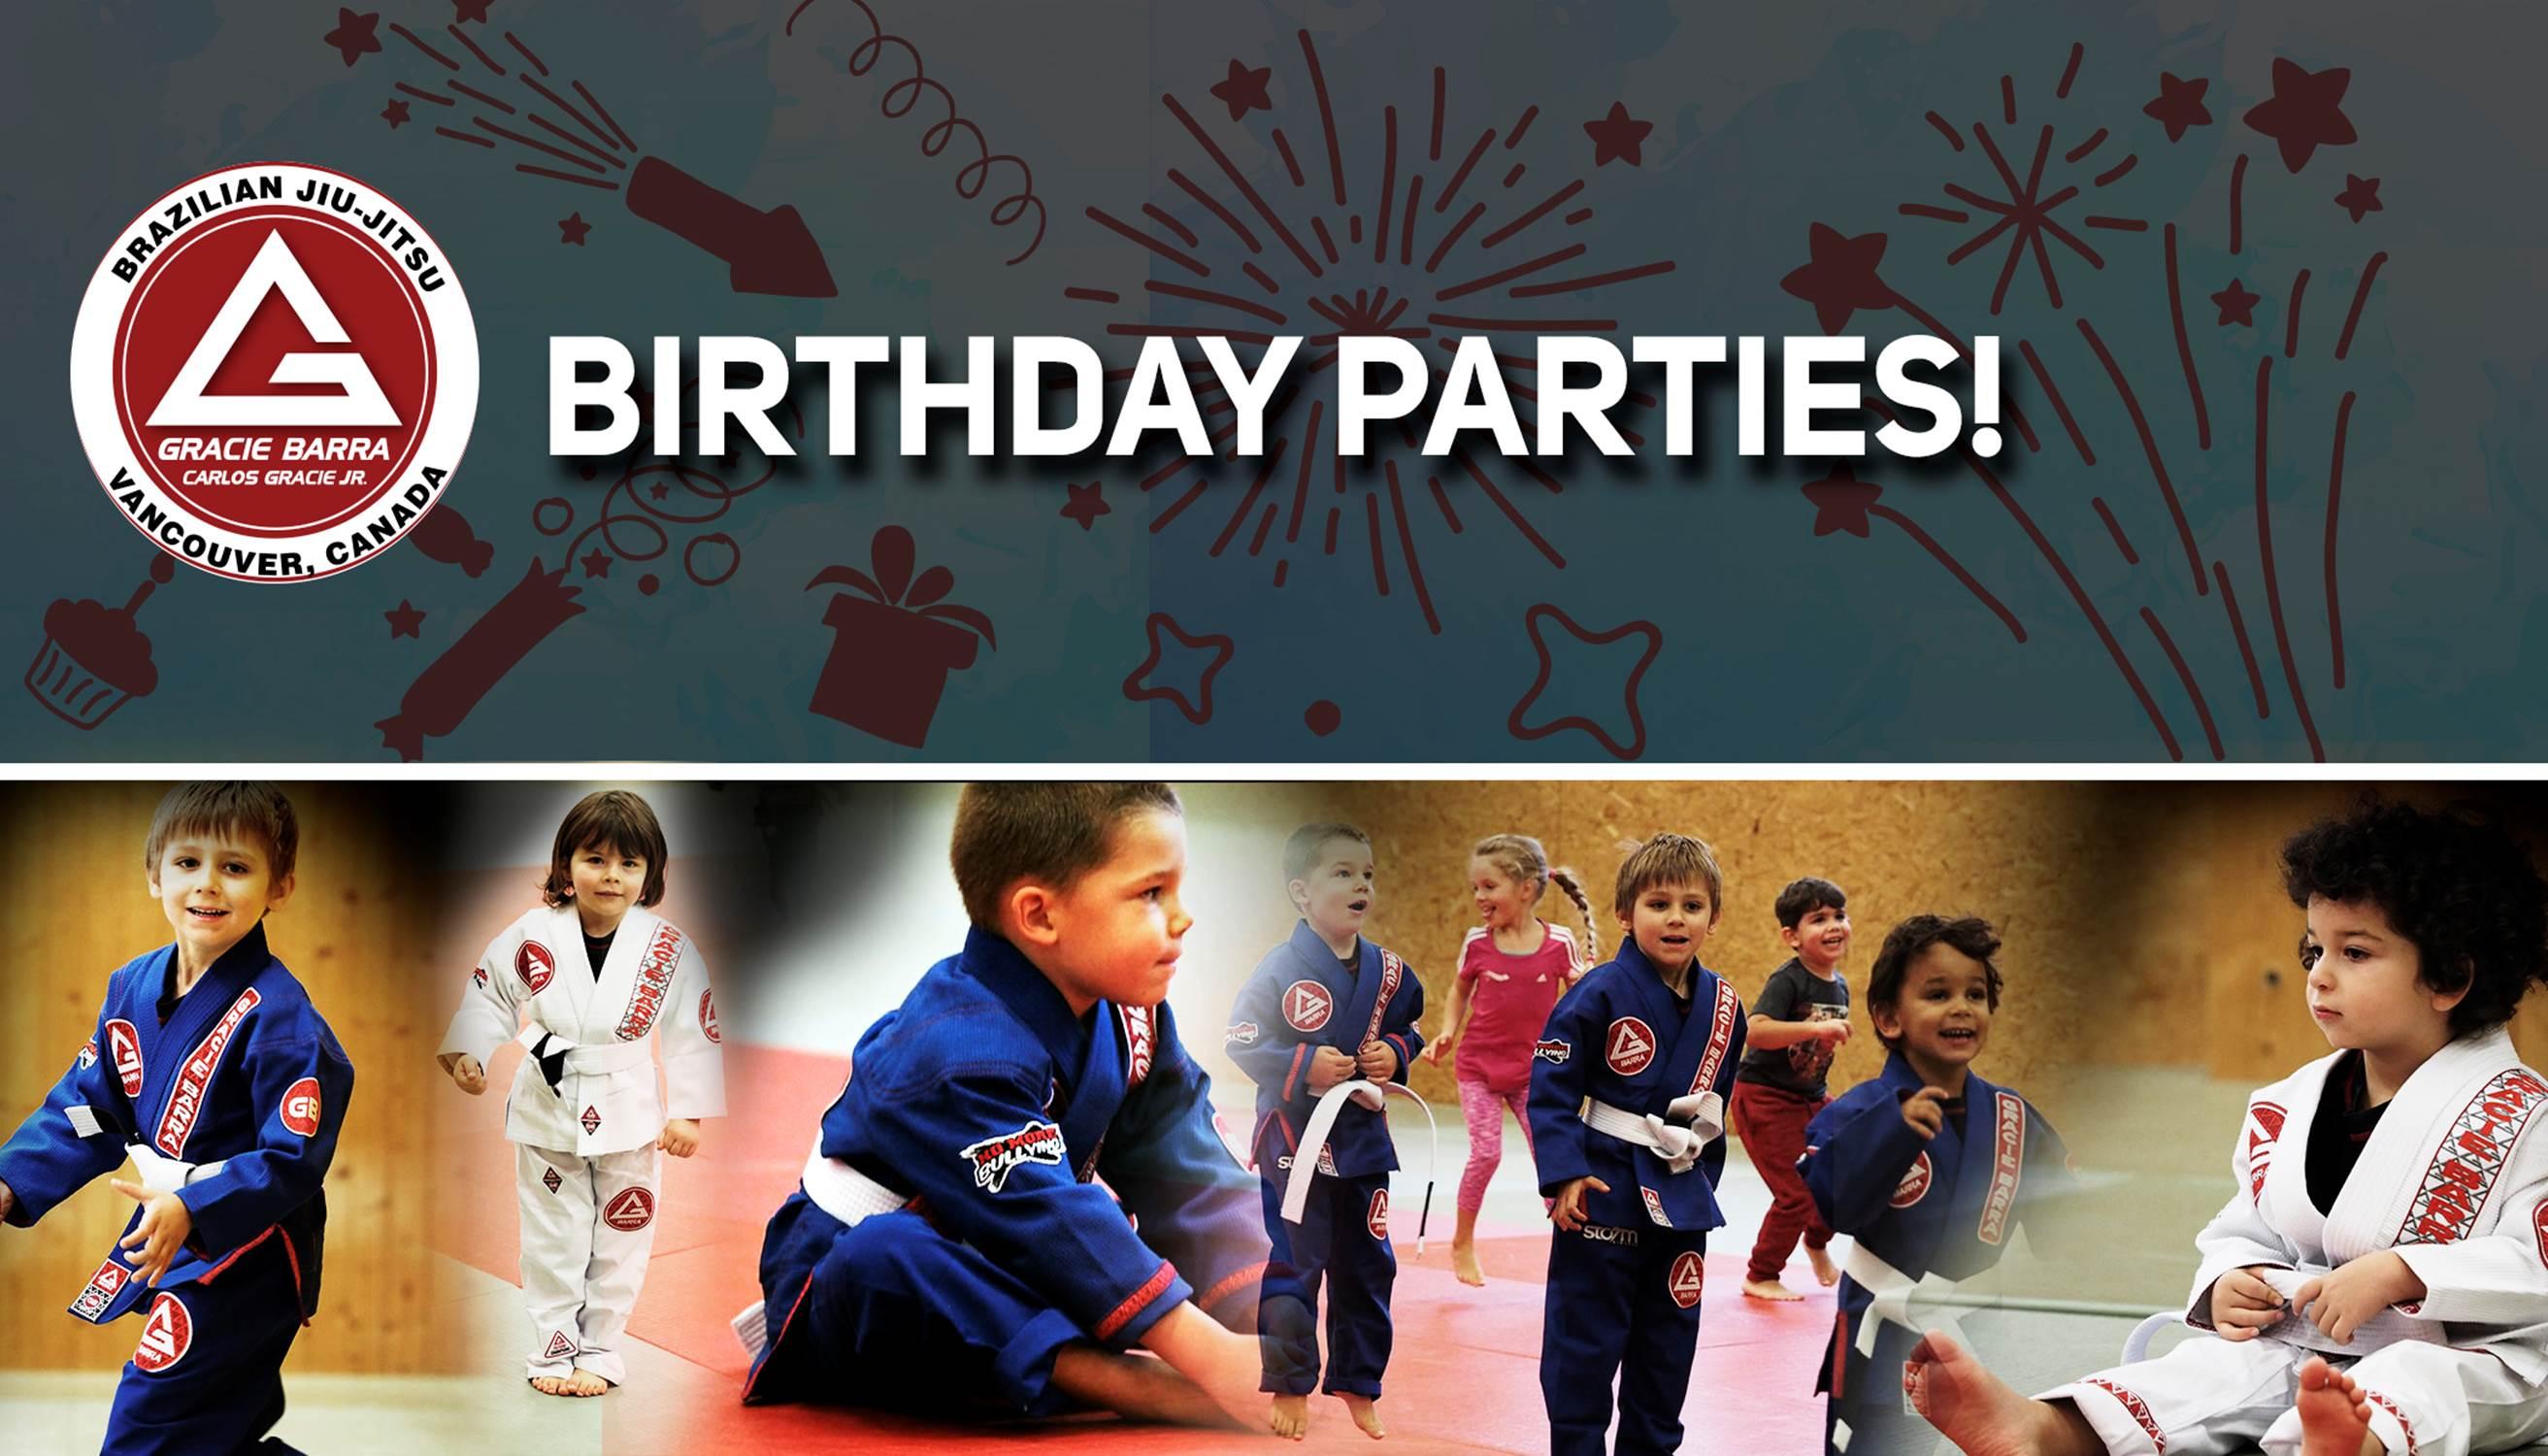 Birthday Parties Flyer